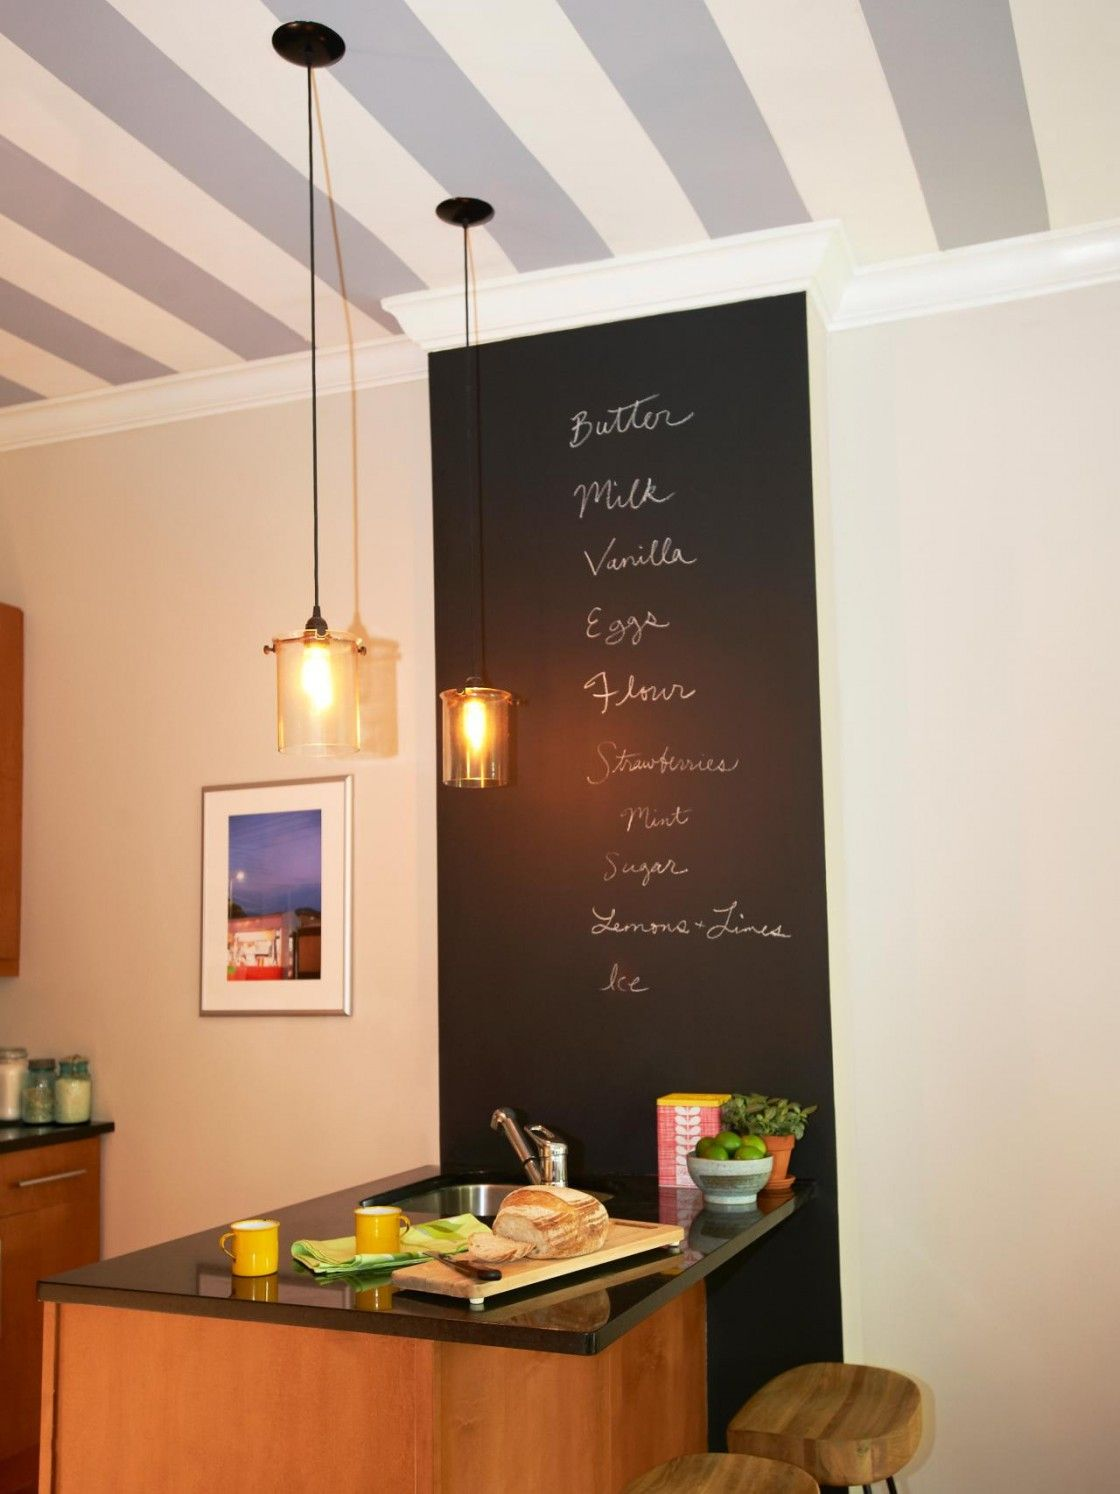 How to paint a ceiling how to paint a ceiling with black wooden